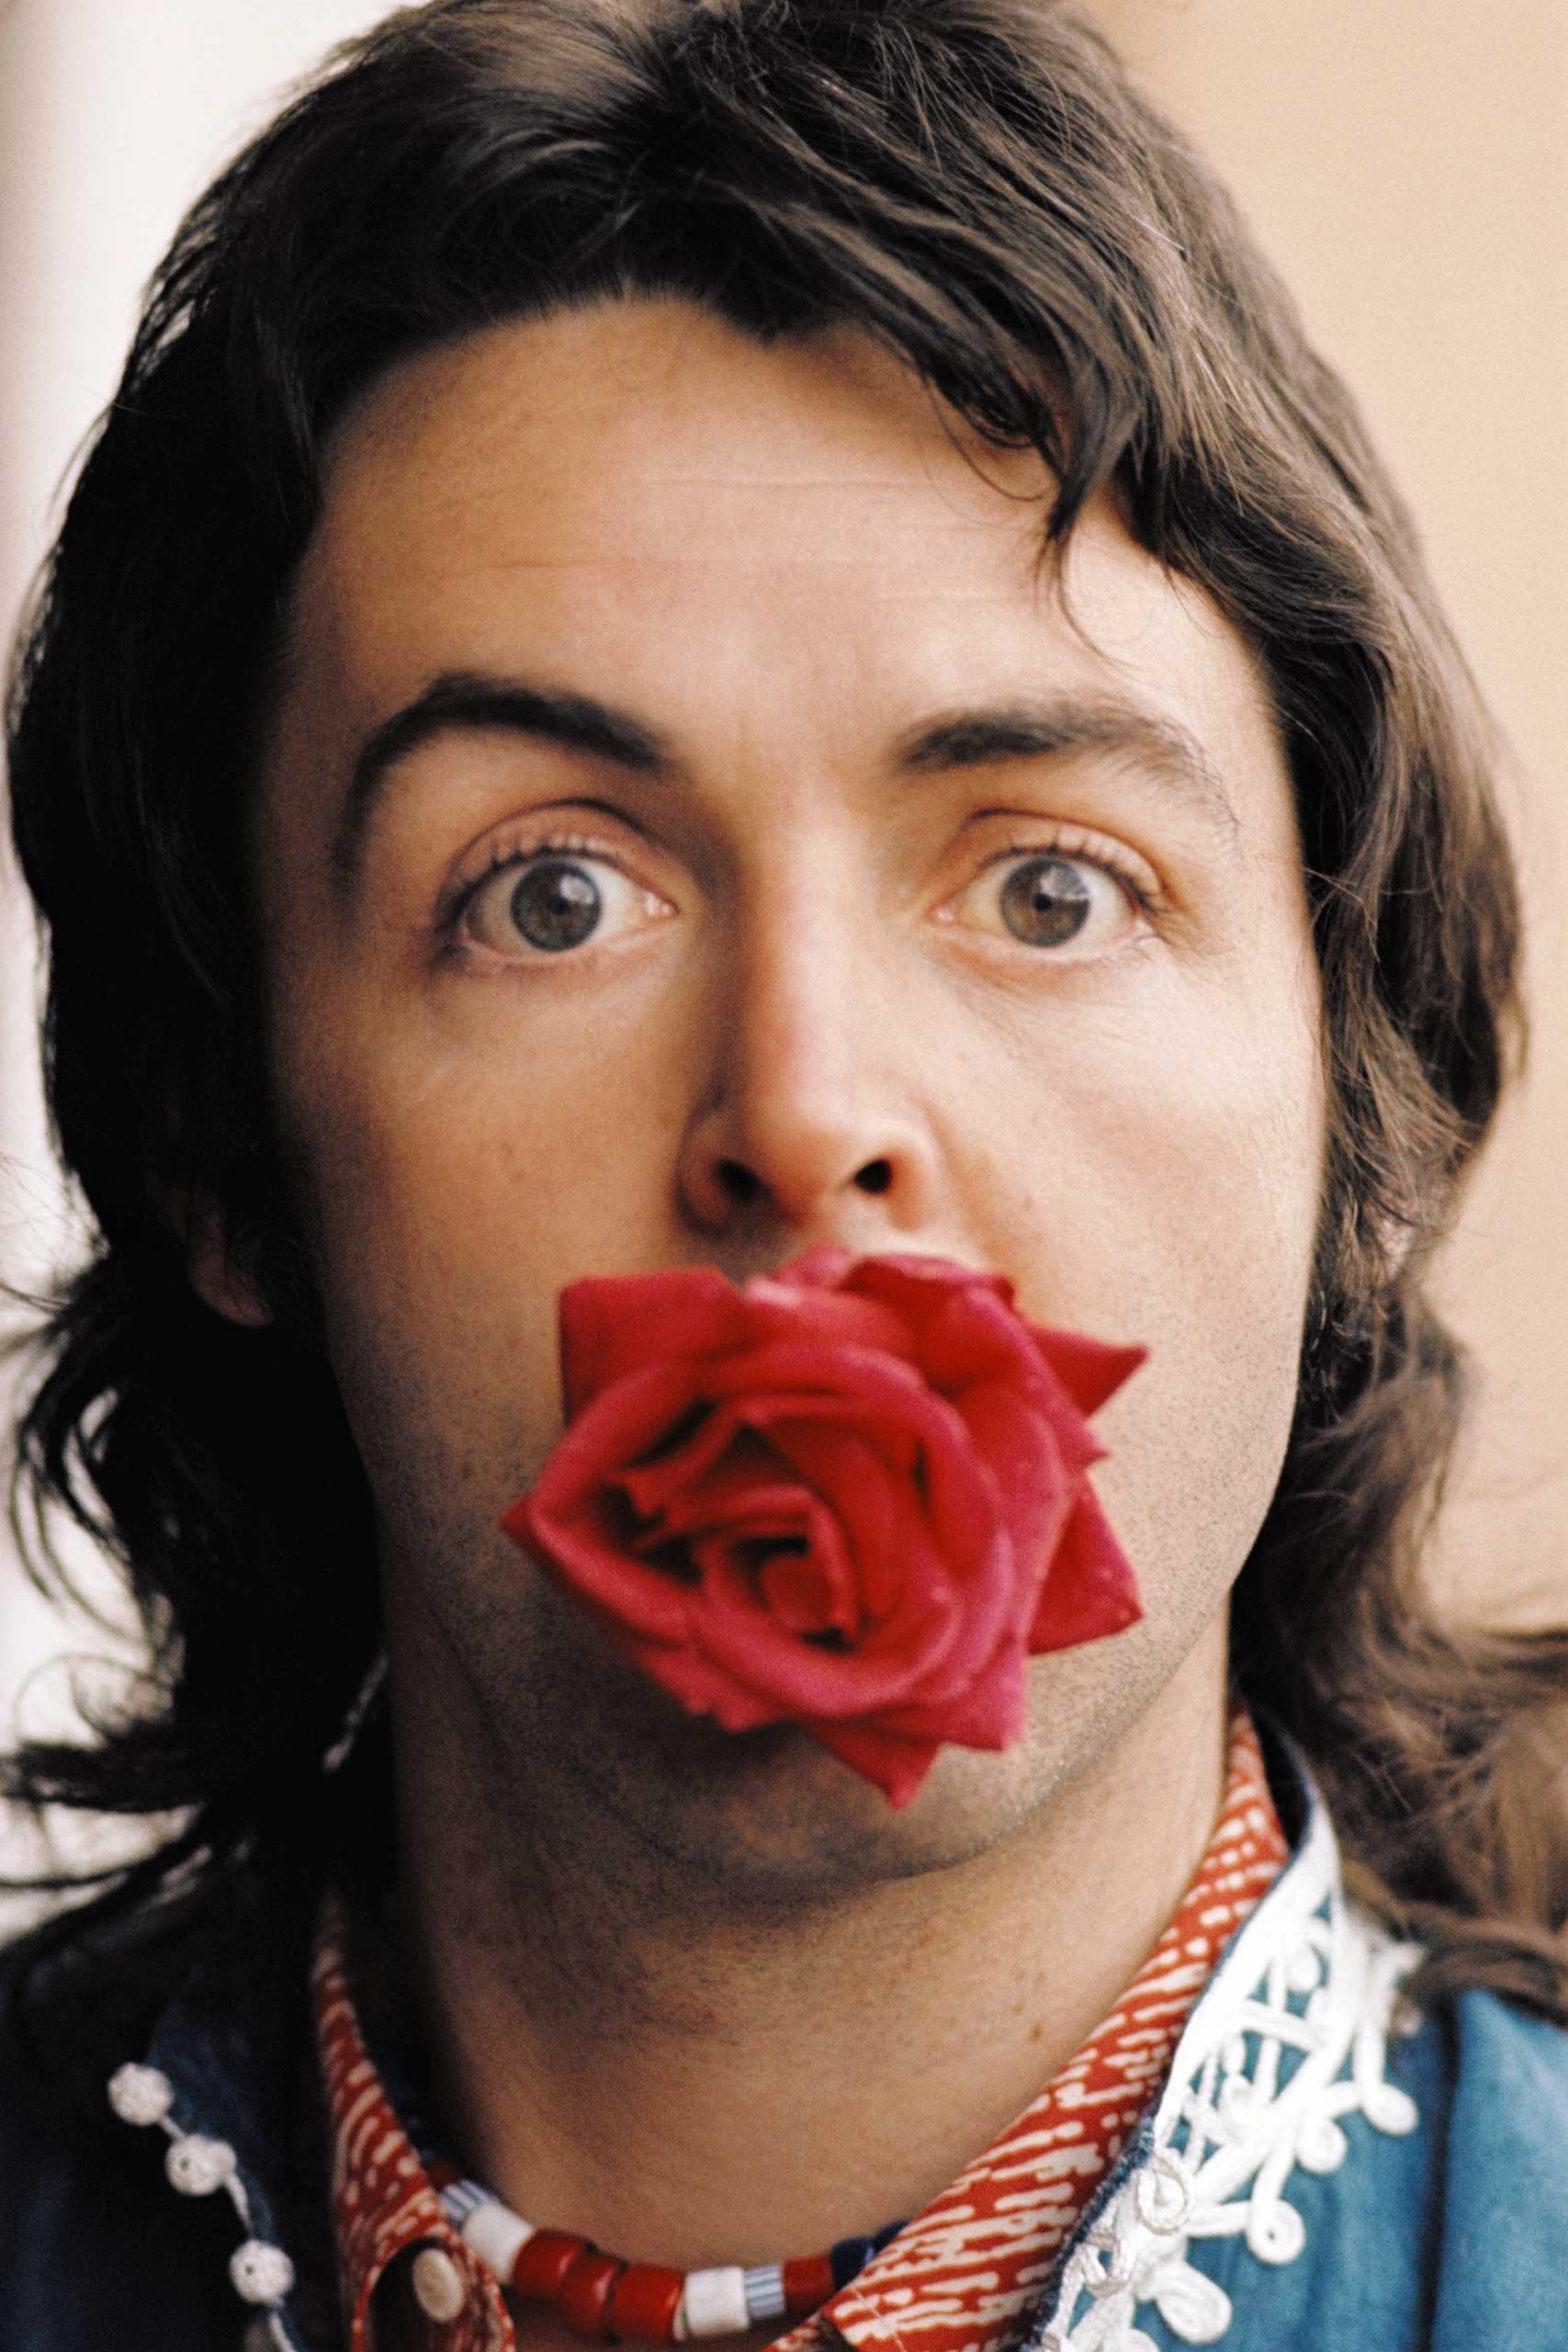 Paul With Rose, Marrakesh, 1972